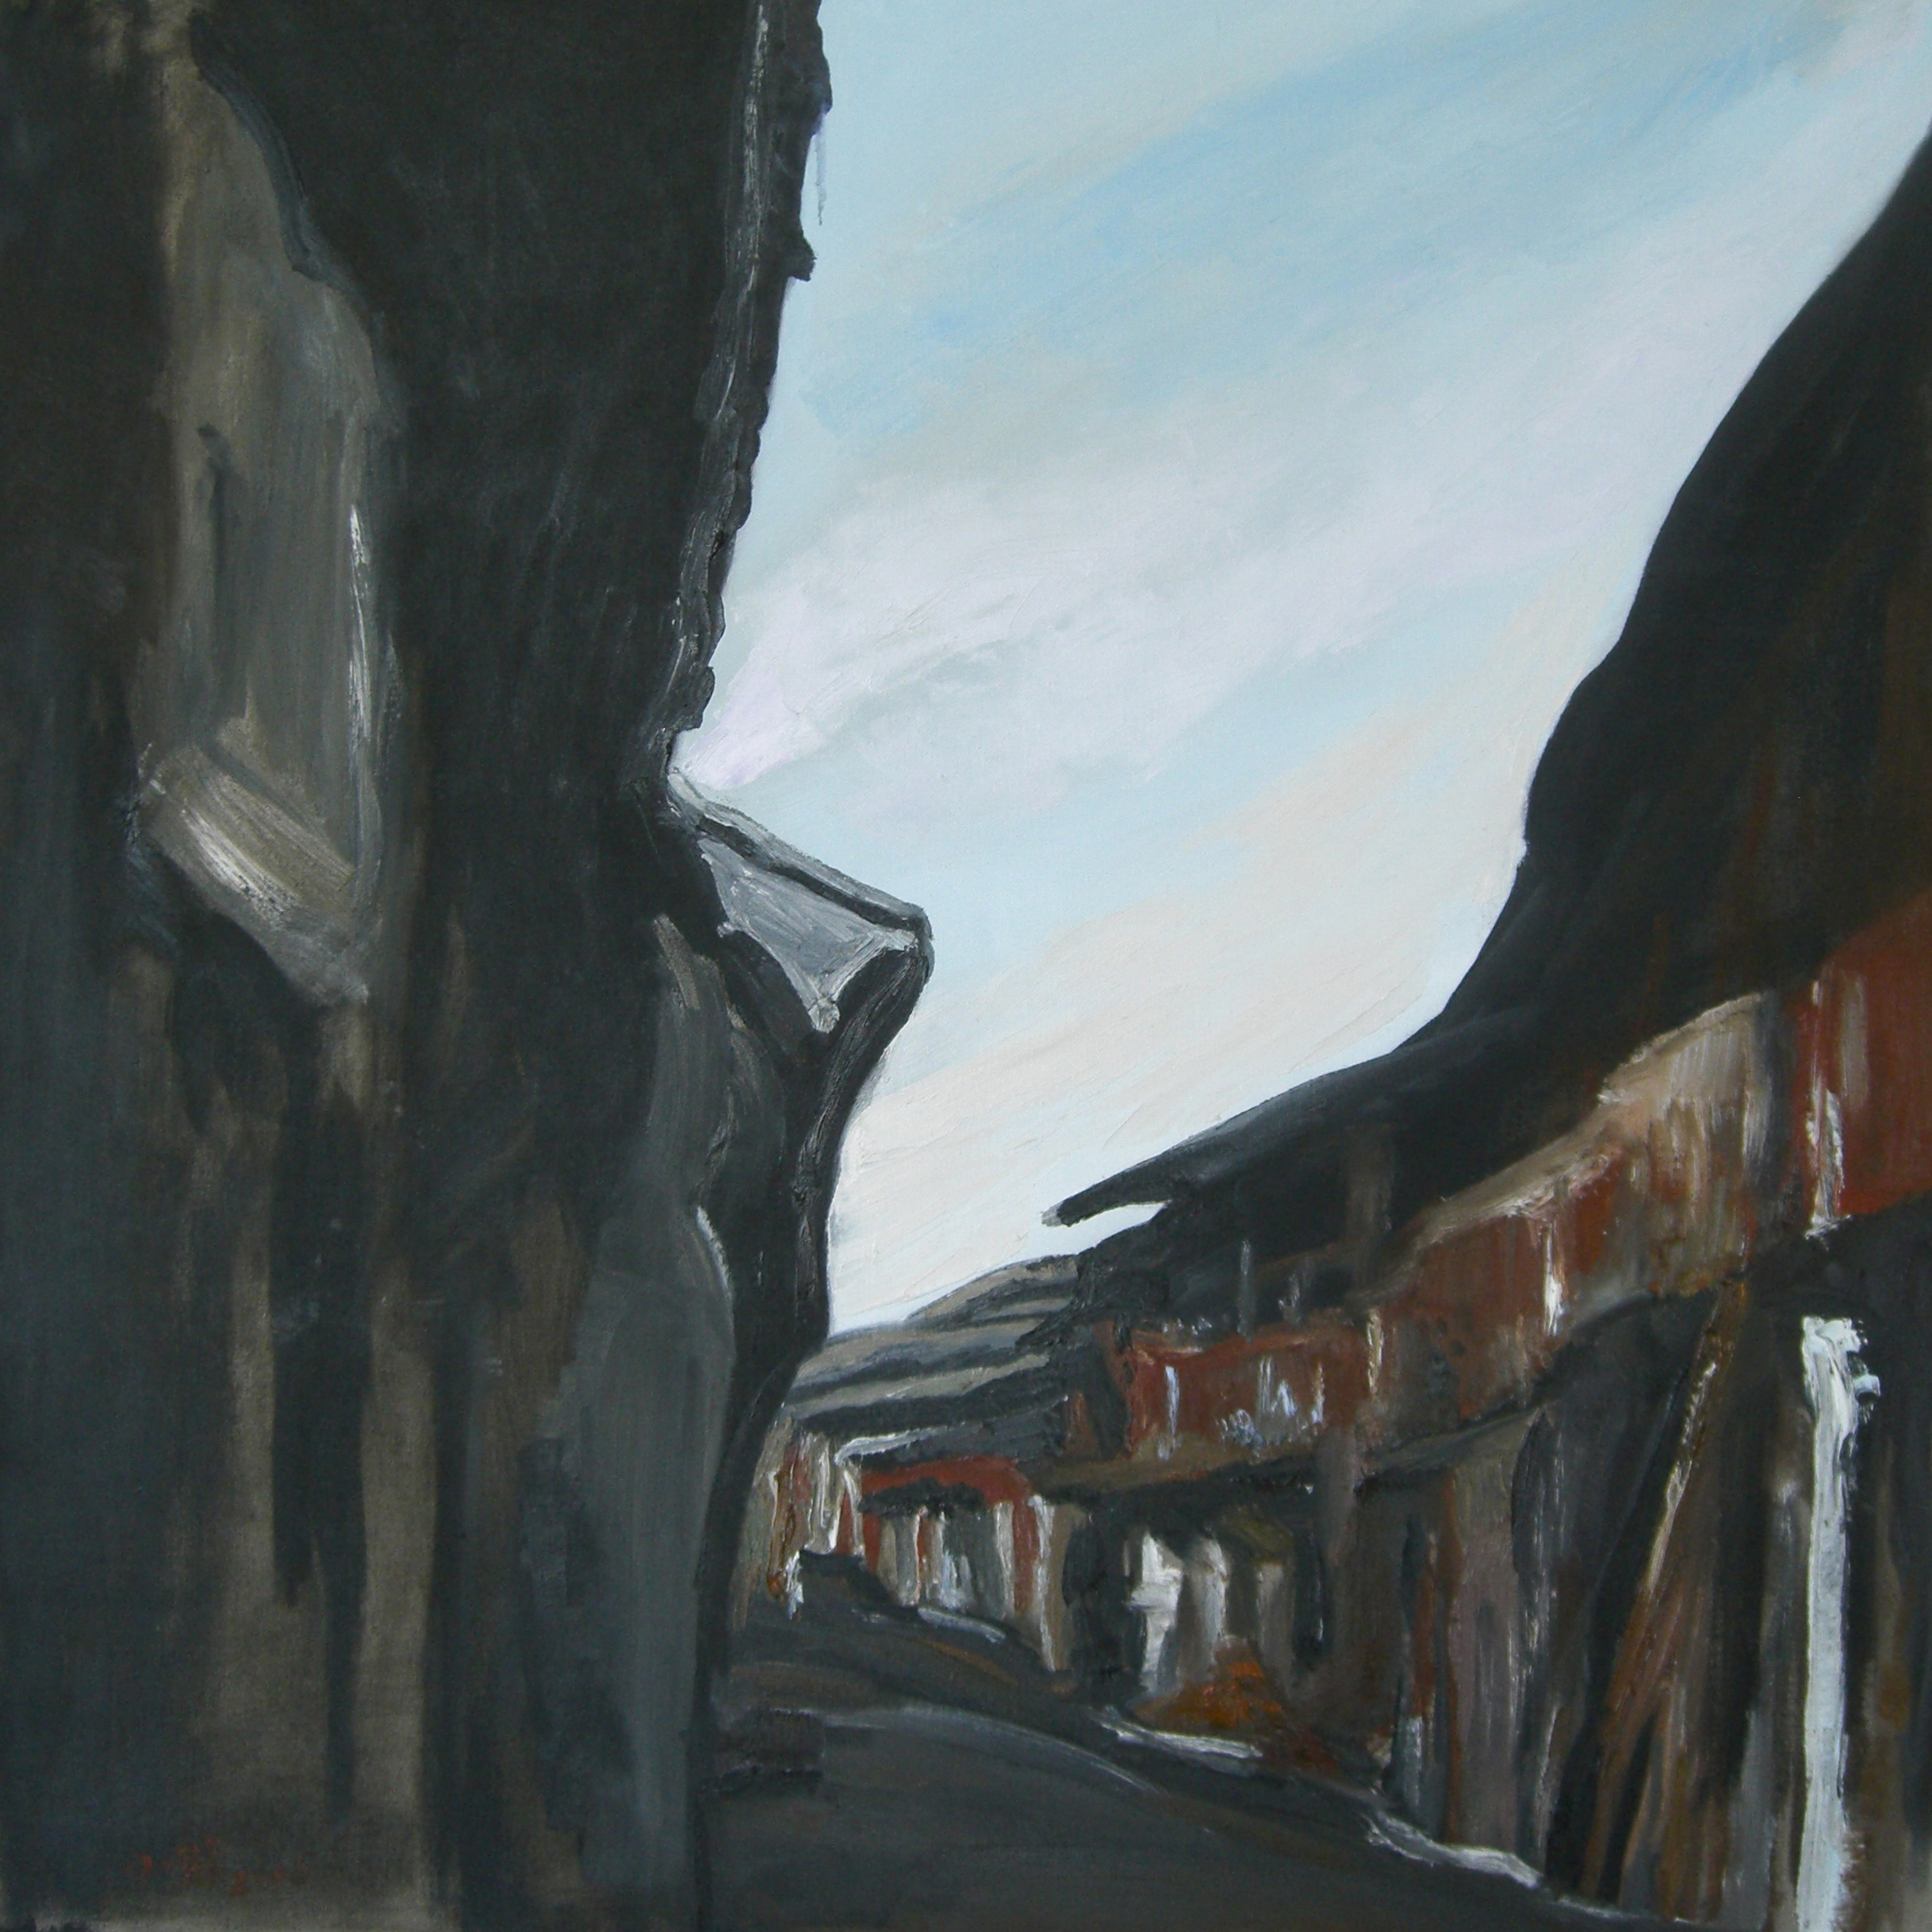 Gao, Xiaofei 街头印象三 100x100  布面油画 $4800.jpg